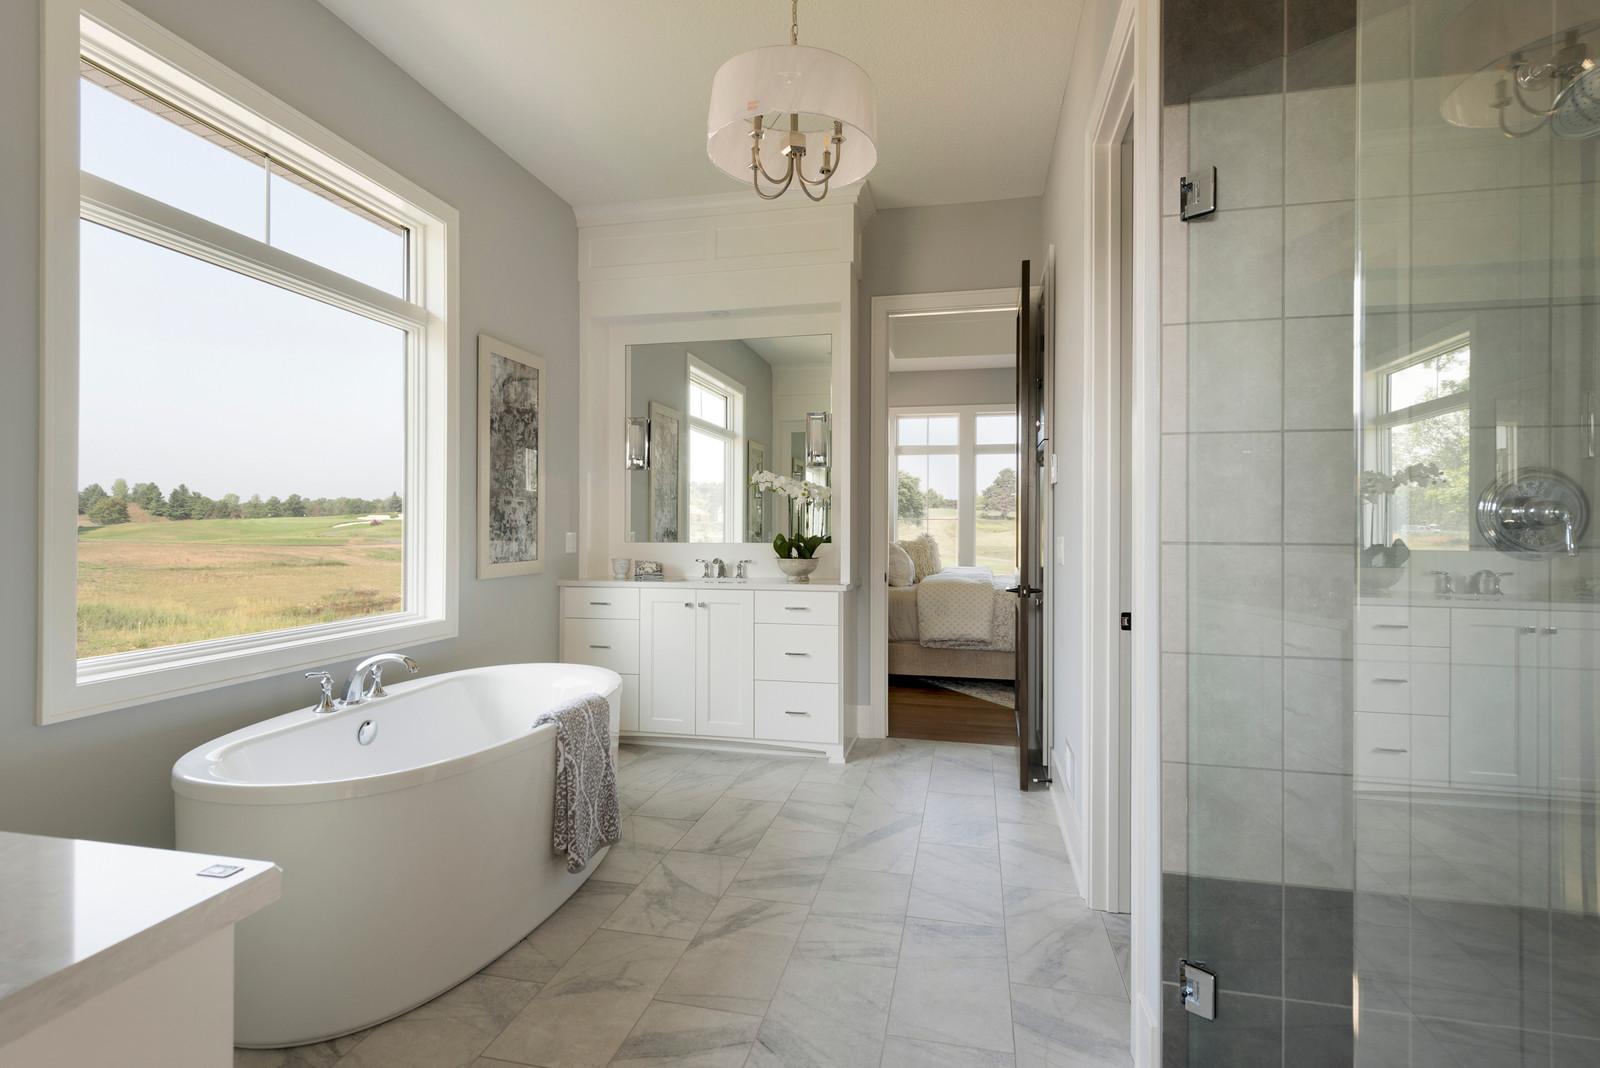 Royal Club Rambler Master Bathroom on log home bathroom designs, french country bathroom designs, split level bathroom designs, farm house bathroom designs, transitional bathroom designs,